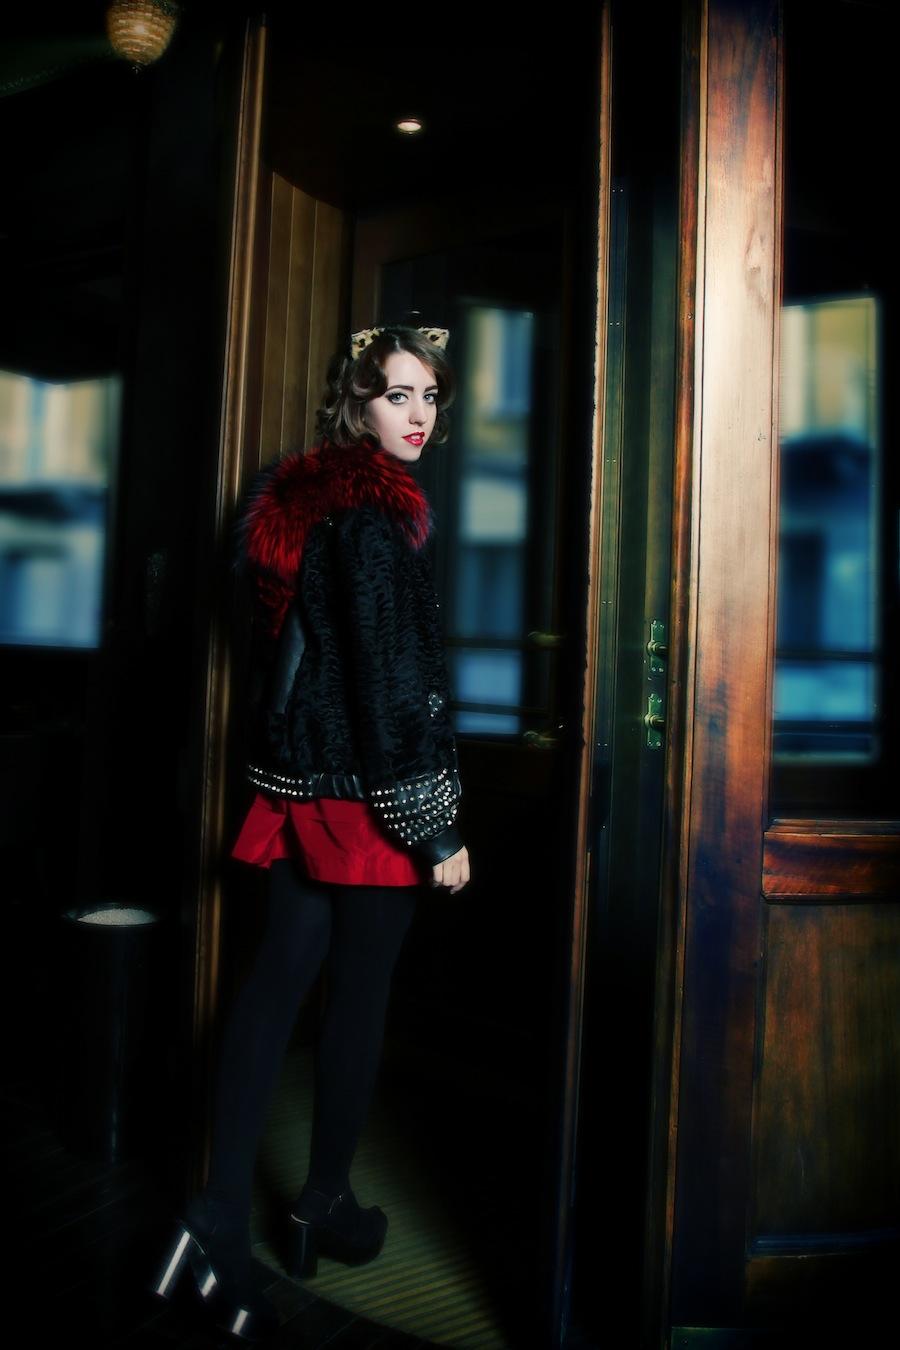 lady_fur_fur_coat